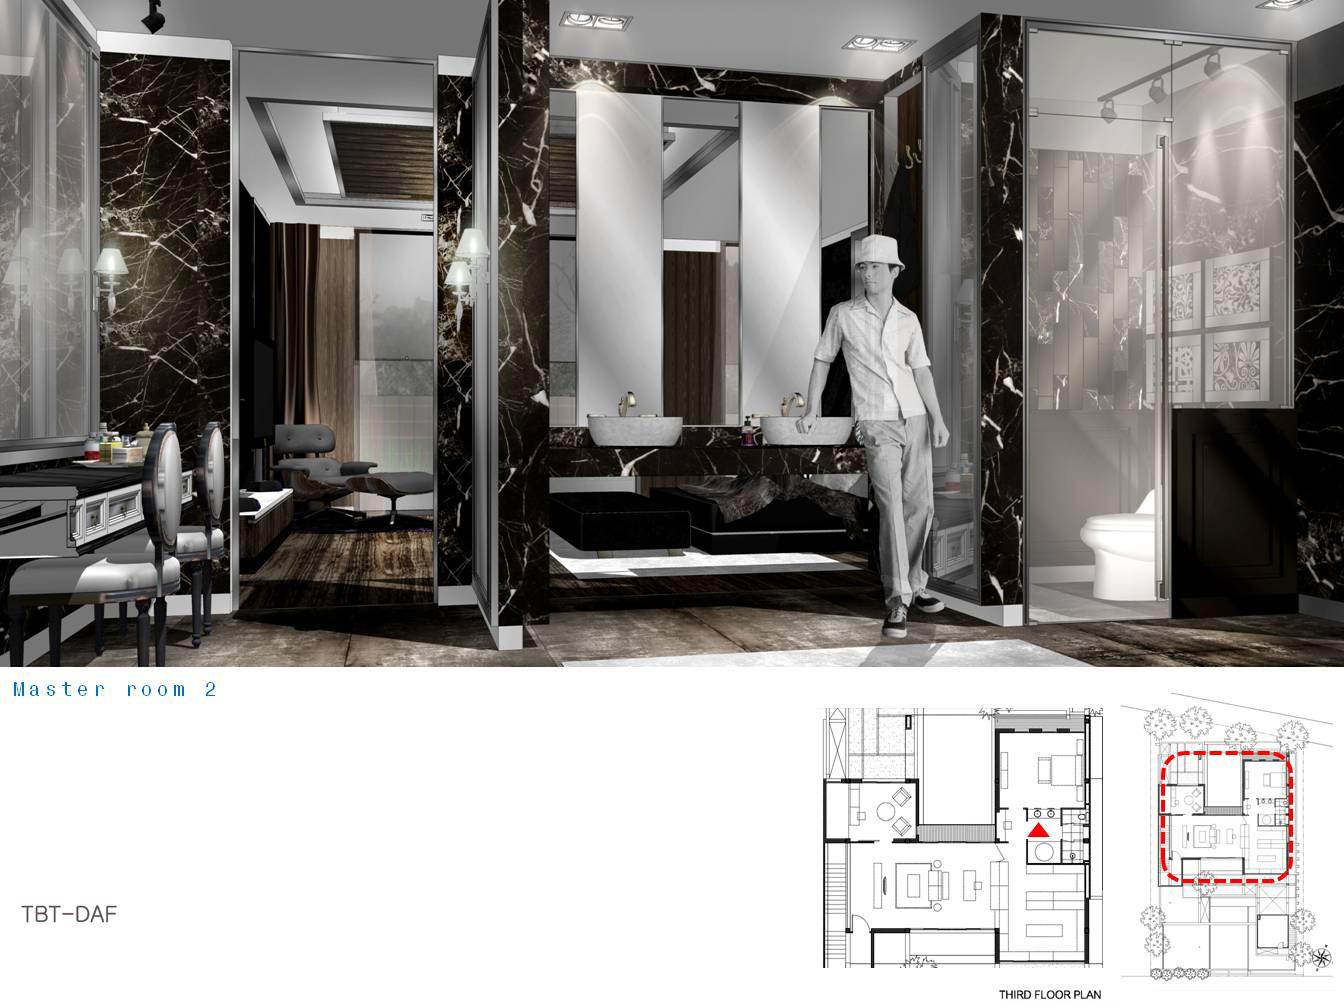 TBT-DAF interior design house robinson 28